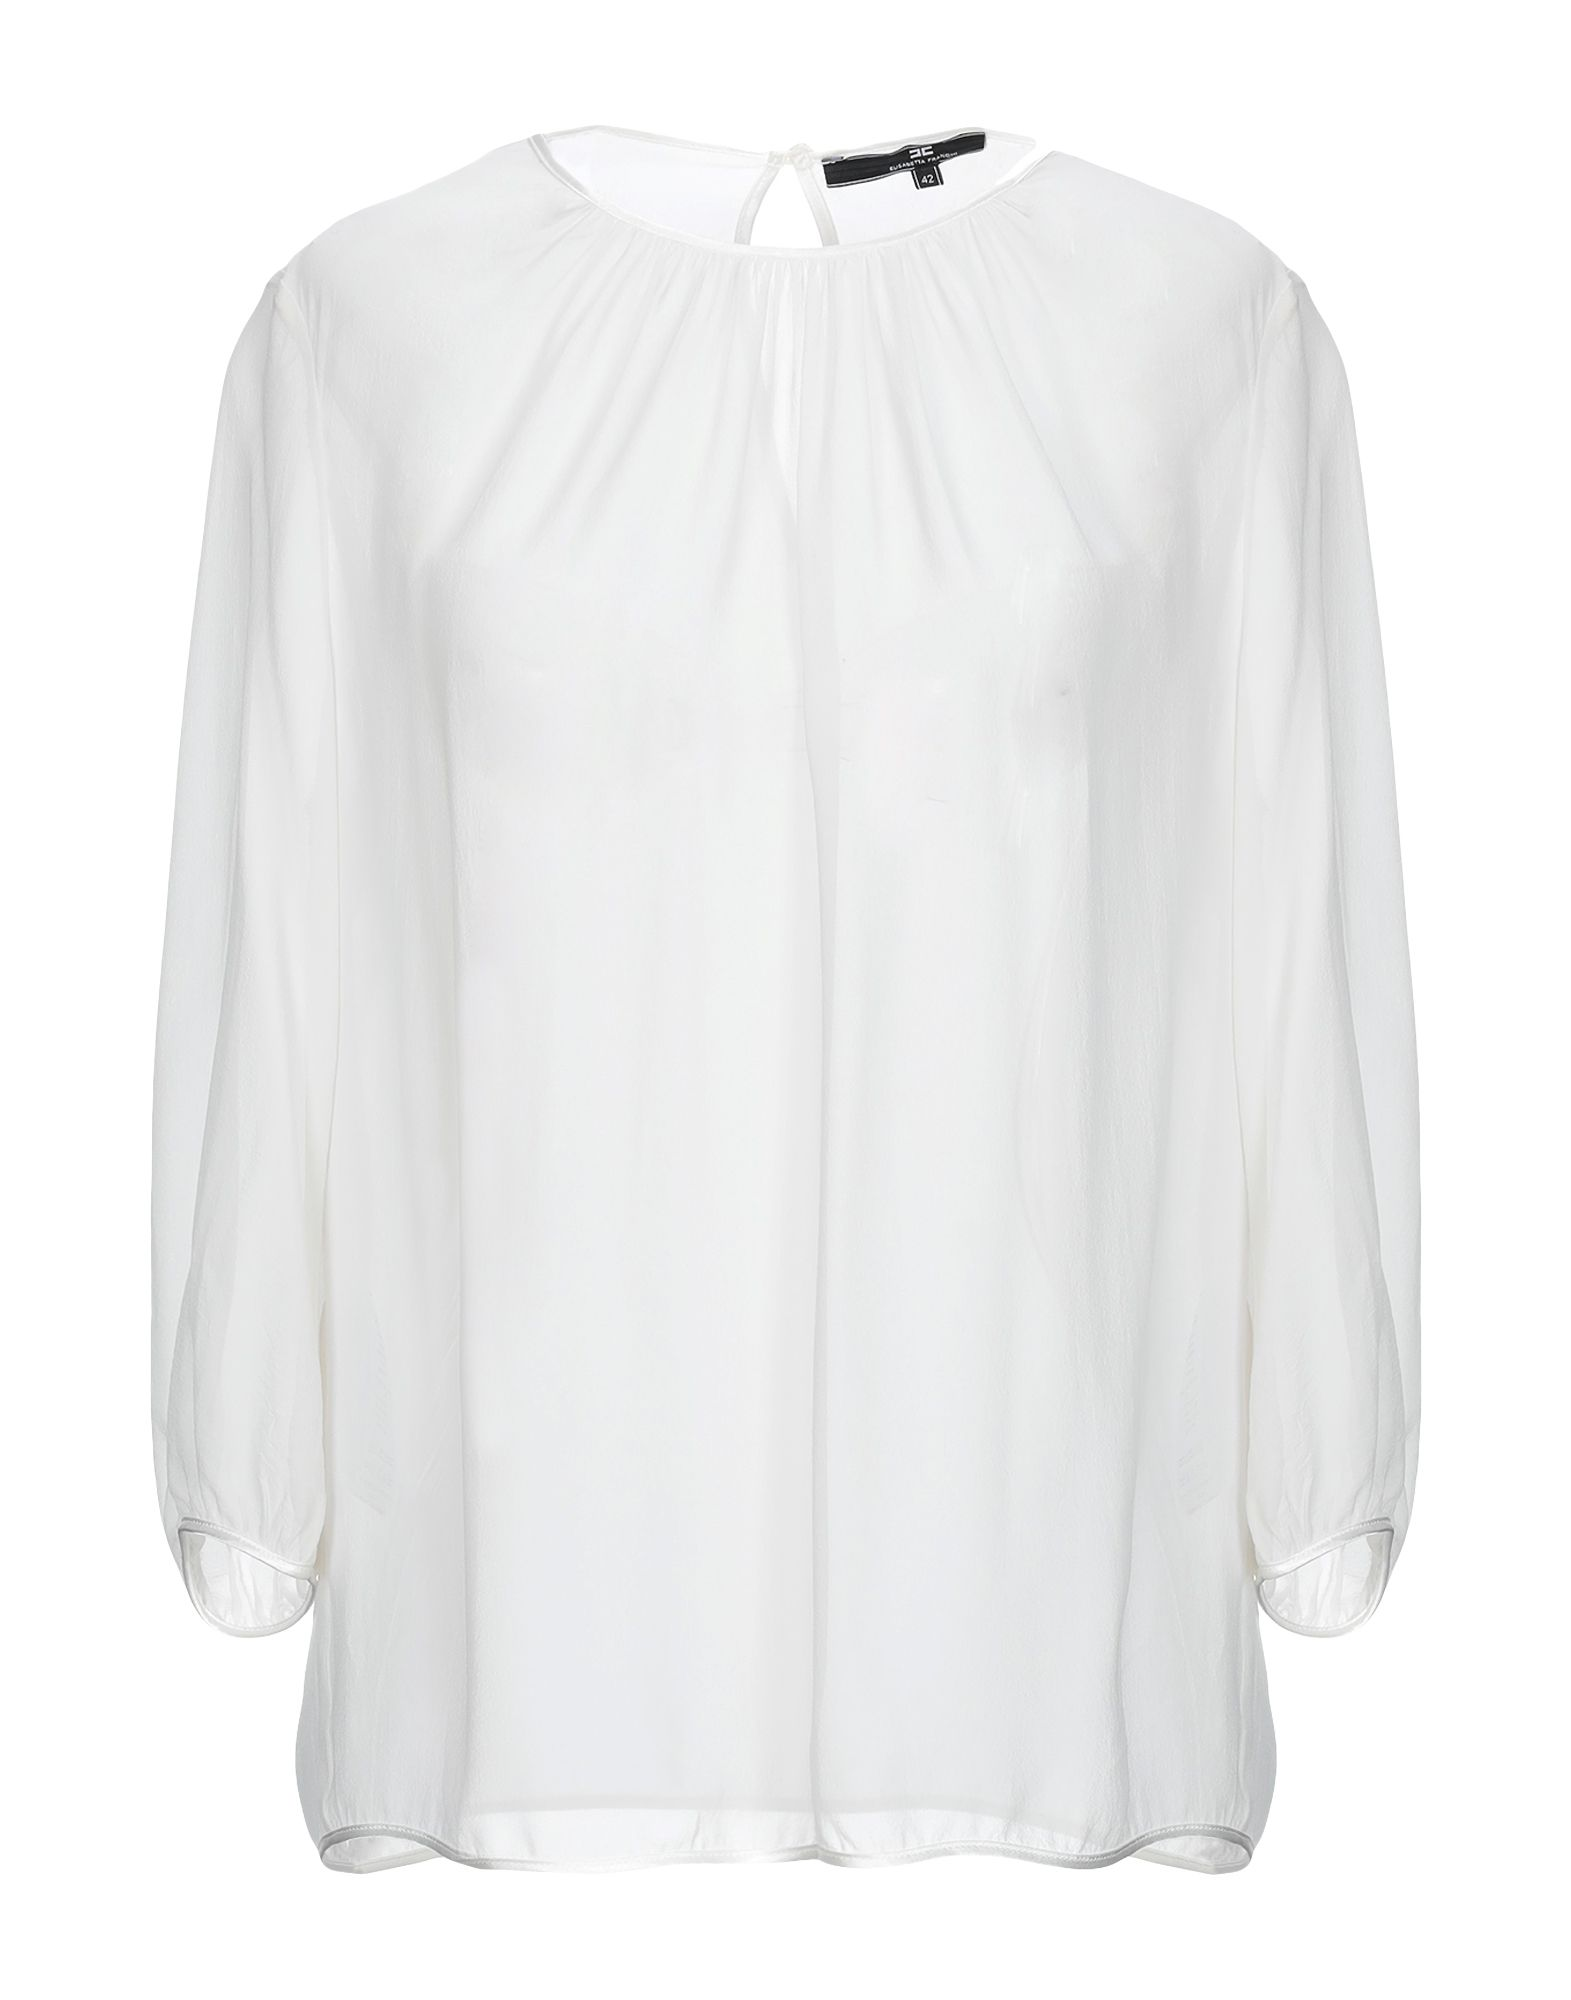 ELISABETTA FRANCHI 24 ORE Блузка elisabetta franchi 24 ore pубашка